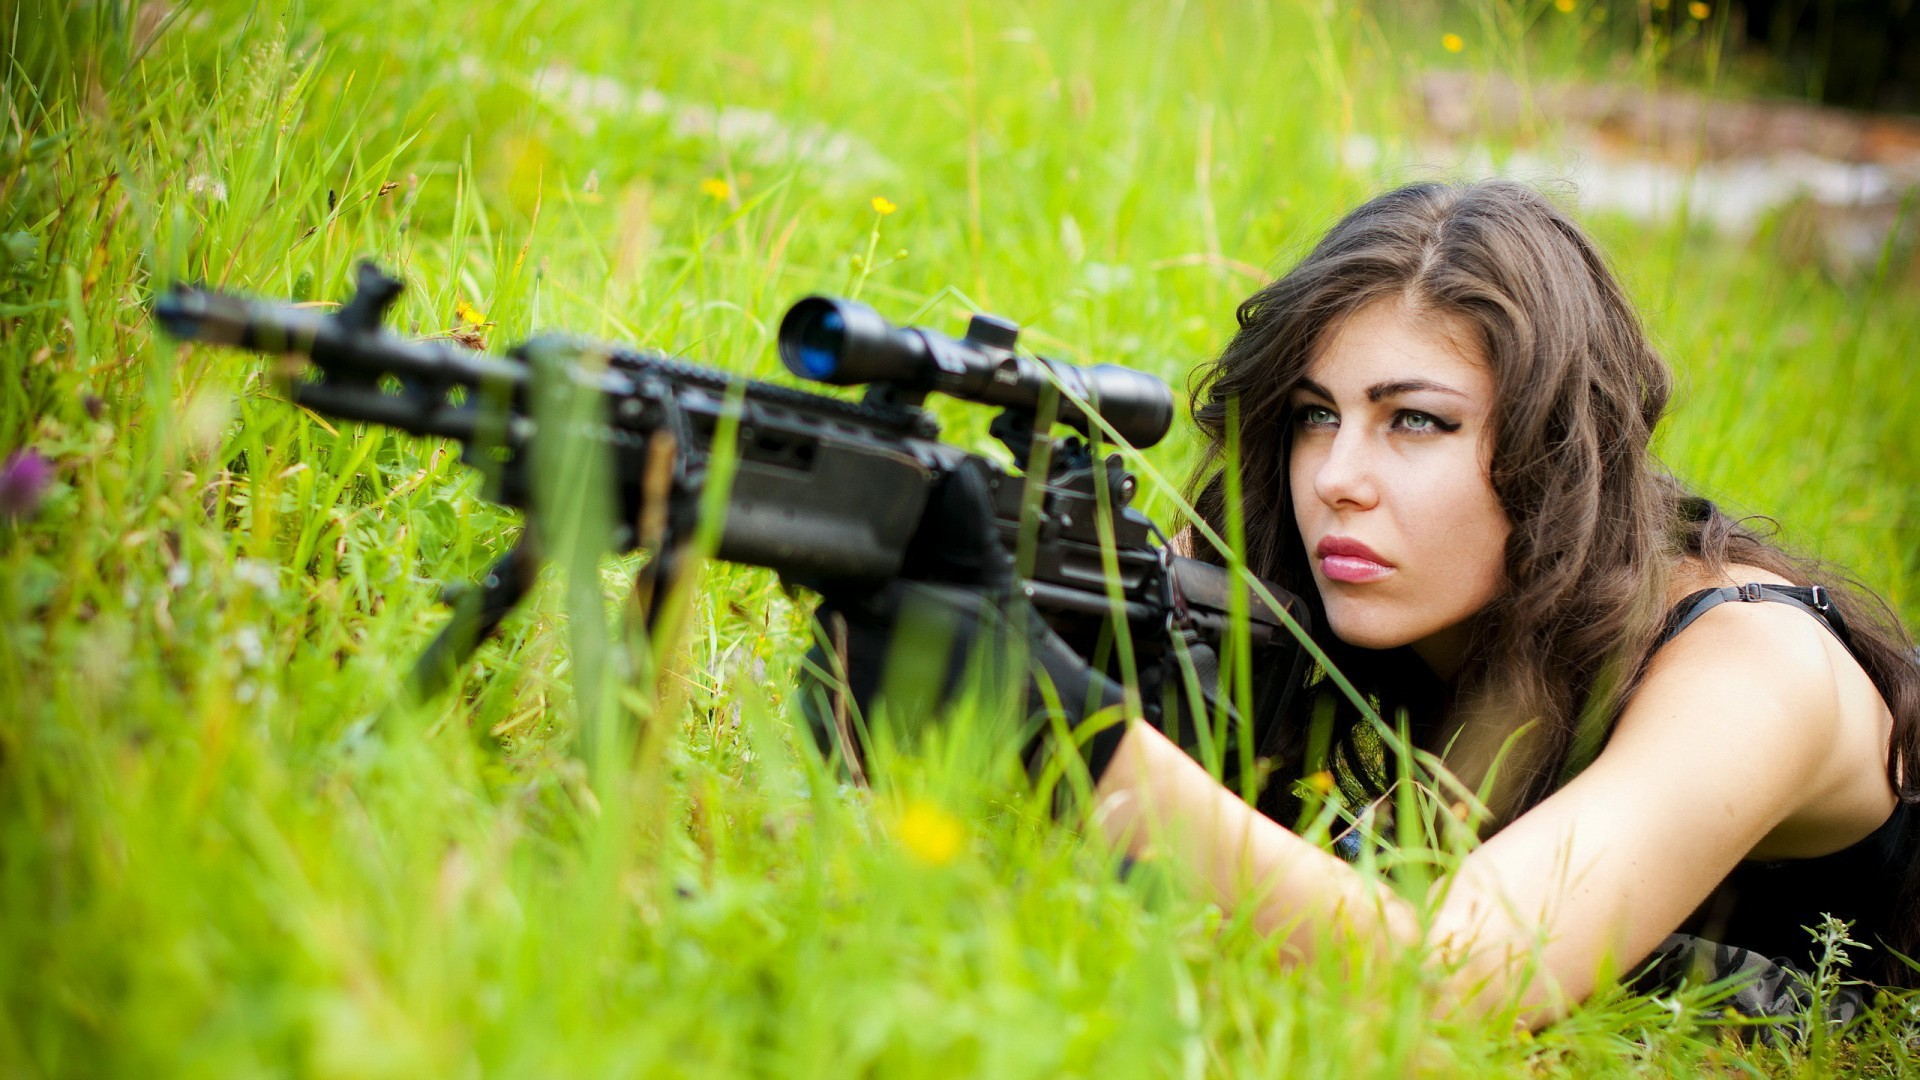 Girls_Sniper_girl_lain_down_in_the_grass_097922_